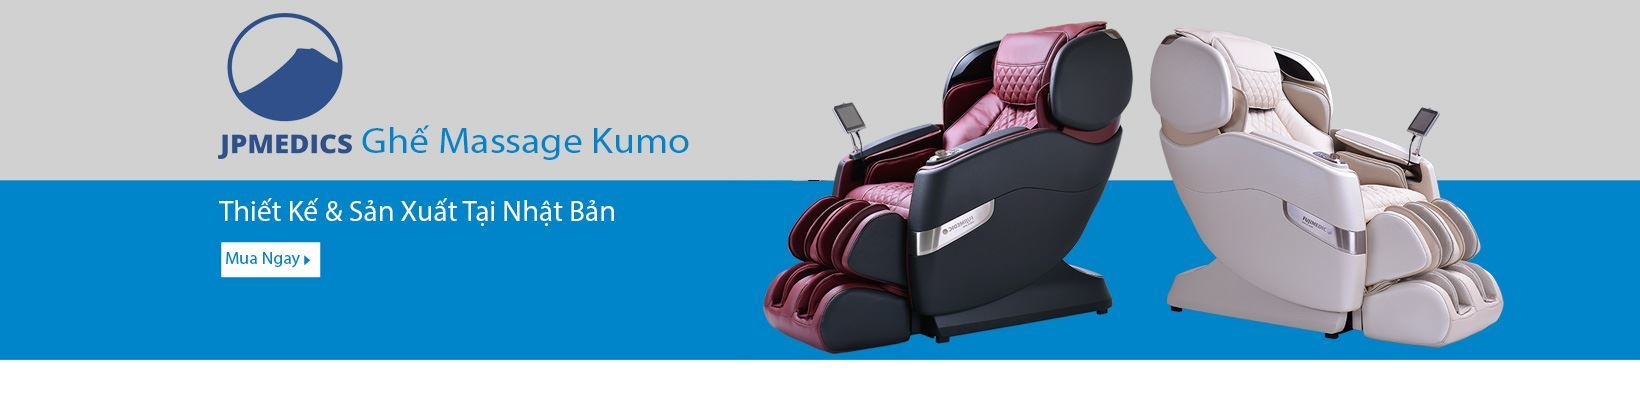 Ghế massage JPMedic Kumo của Nhật Bản